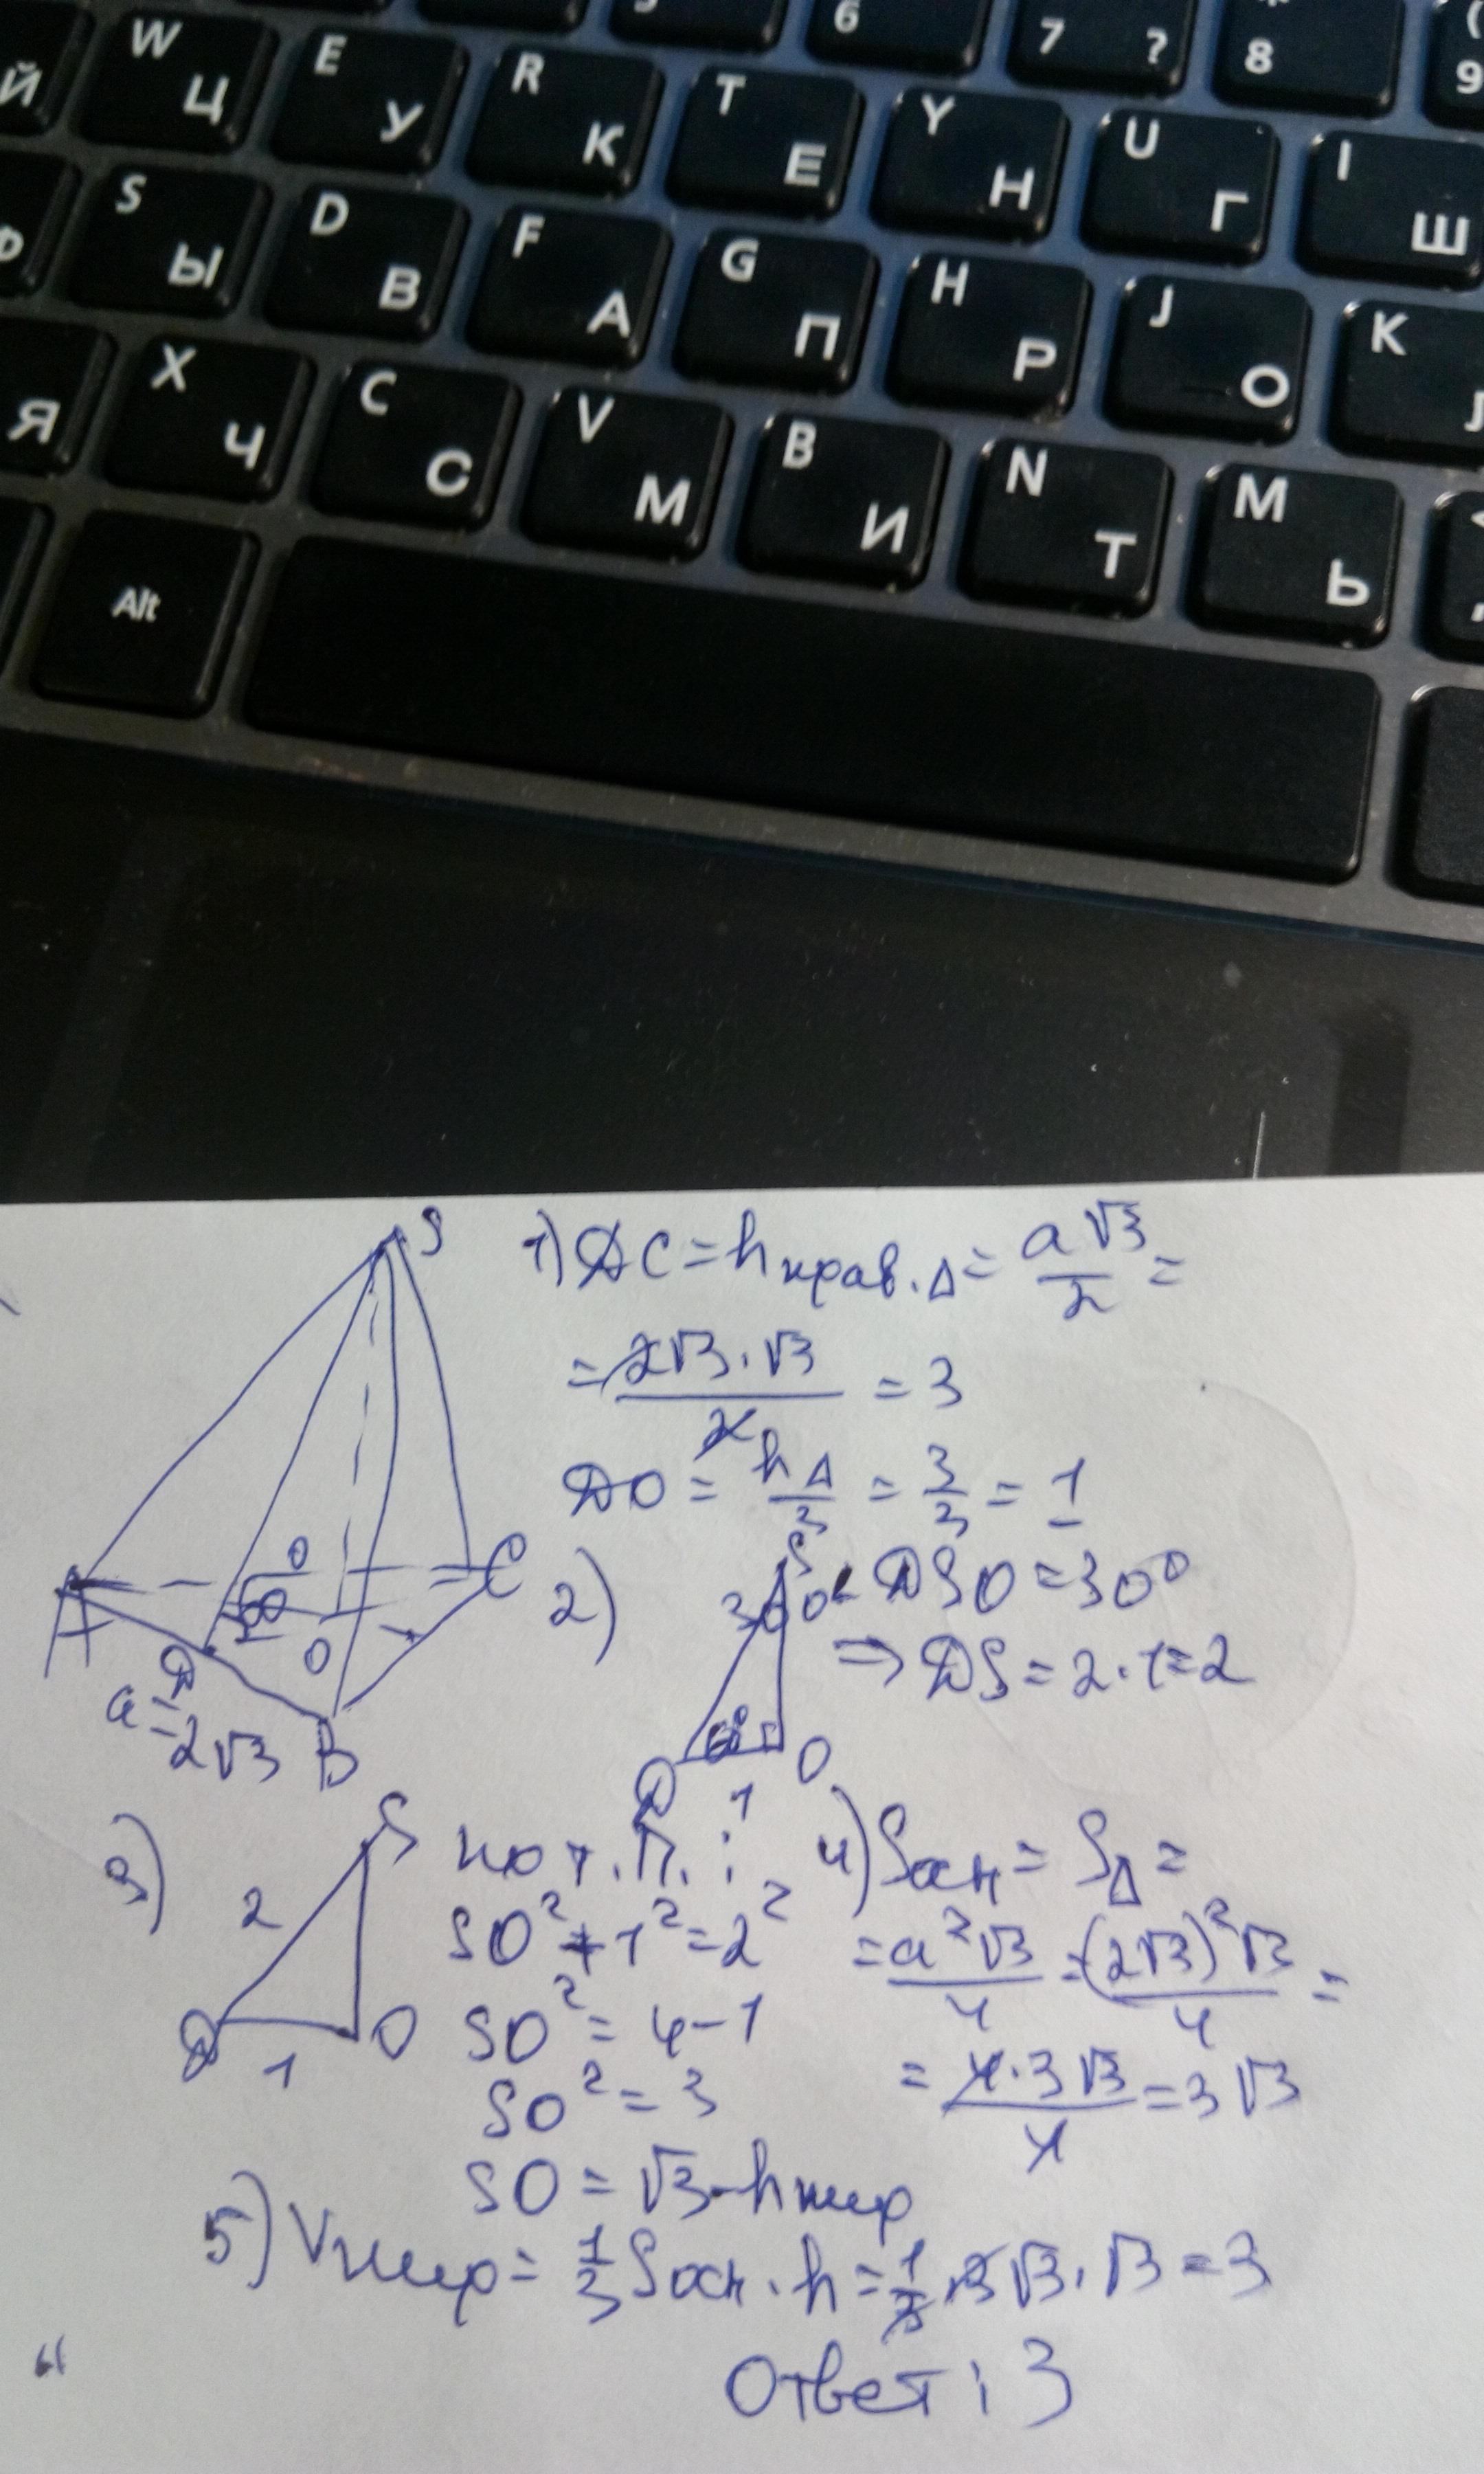 объем параллелепипеда 60 найдите объем треугольной пирамиды